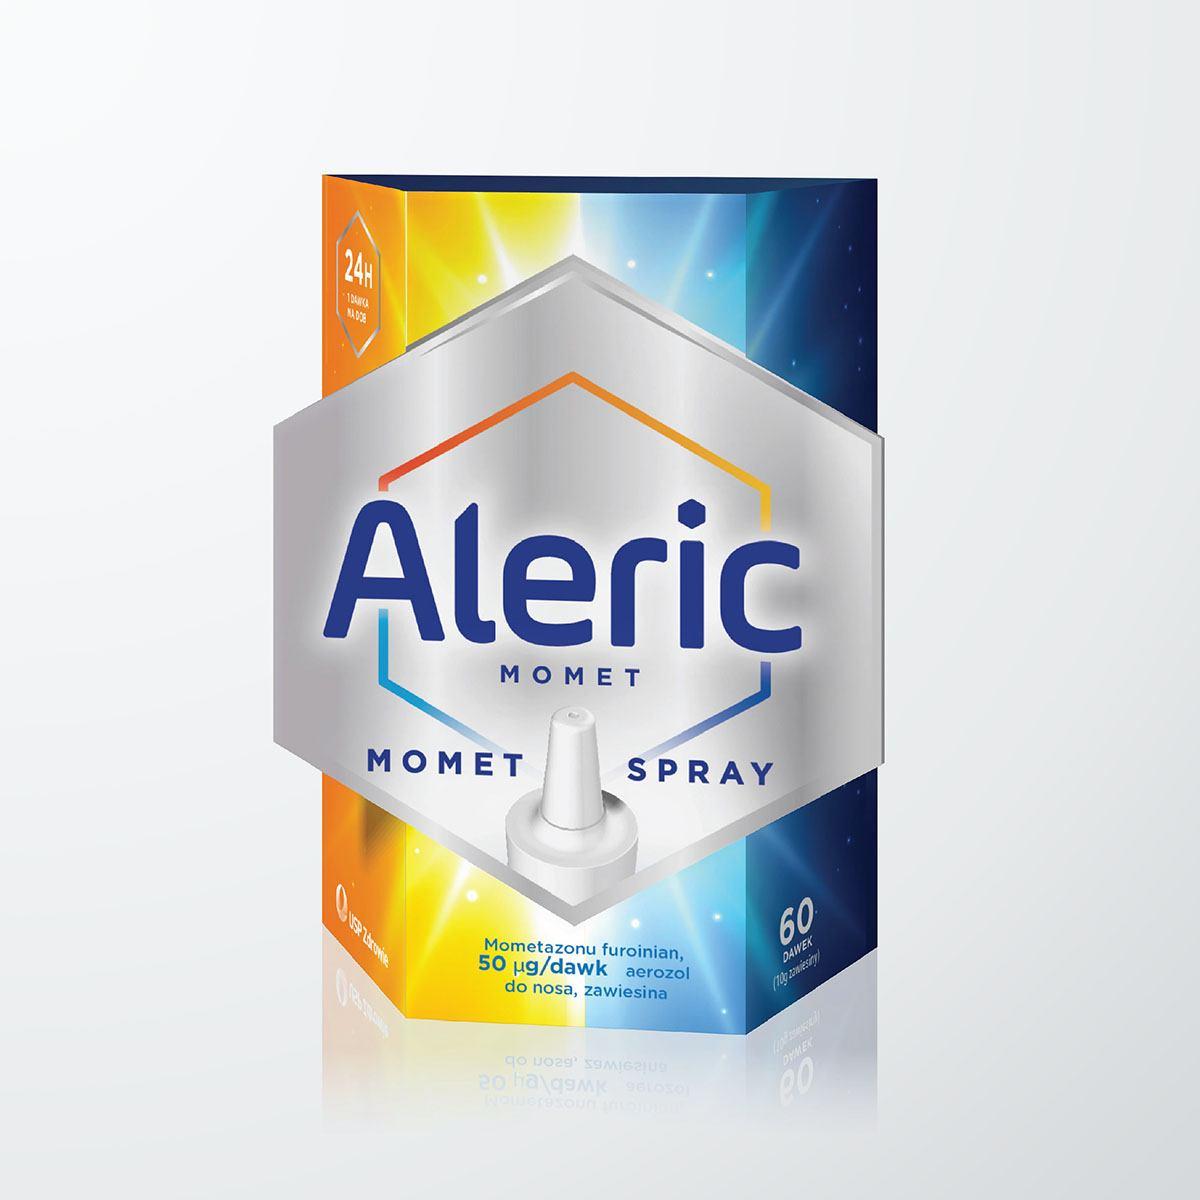 Aleric Spray Phase 1 Concept 1